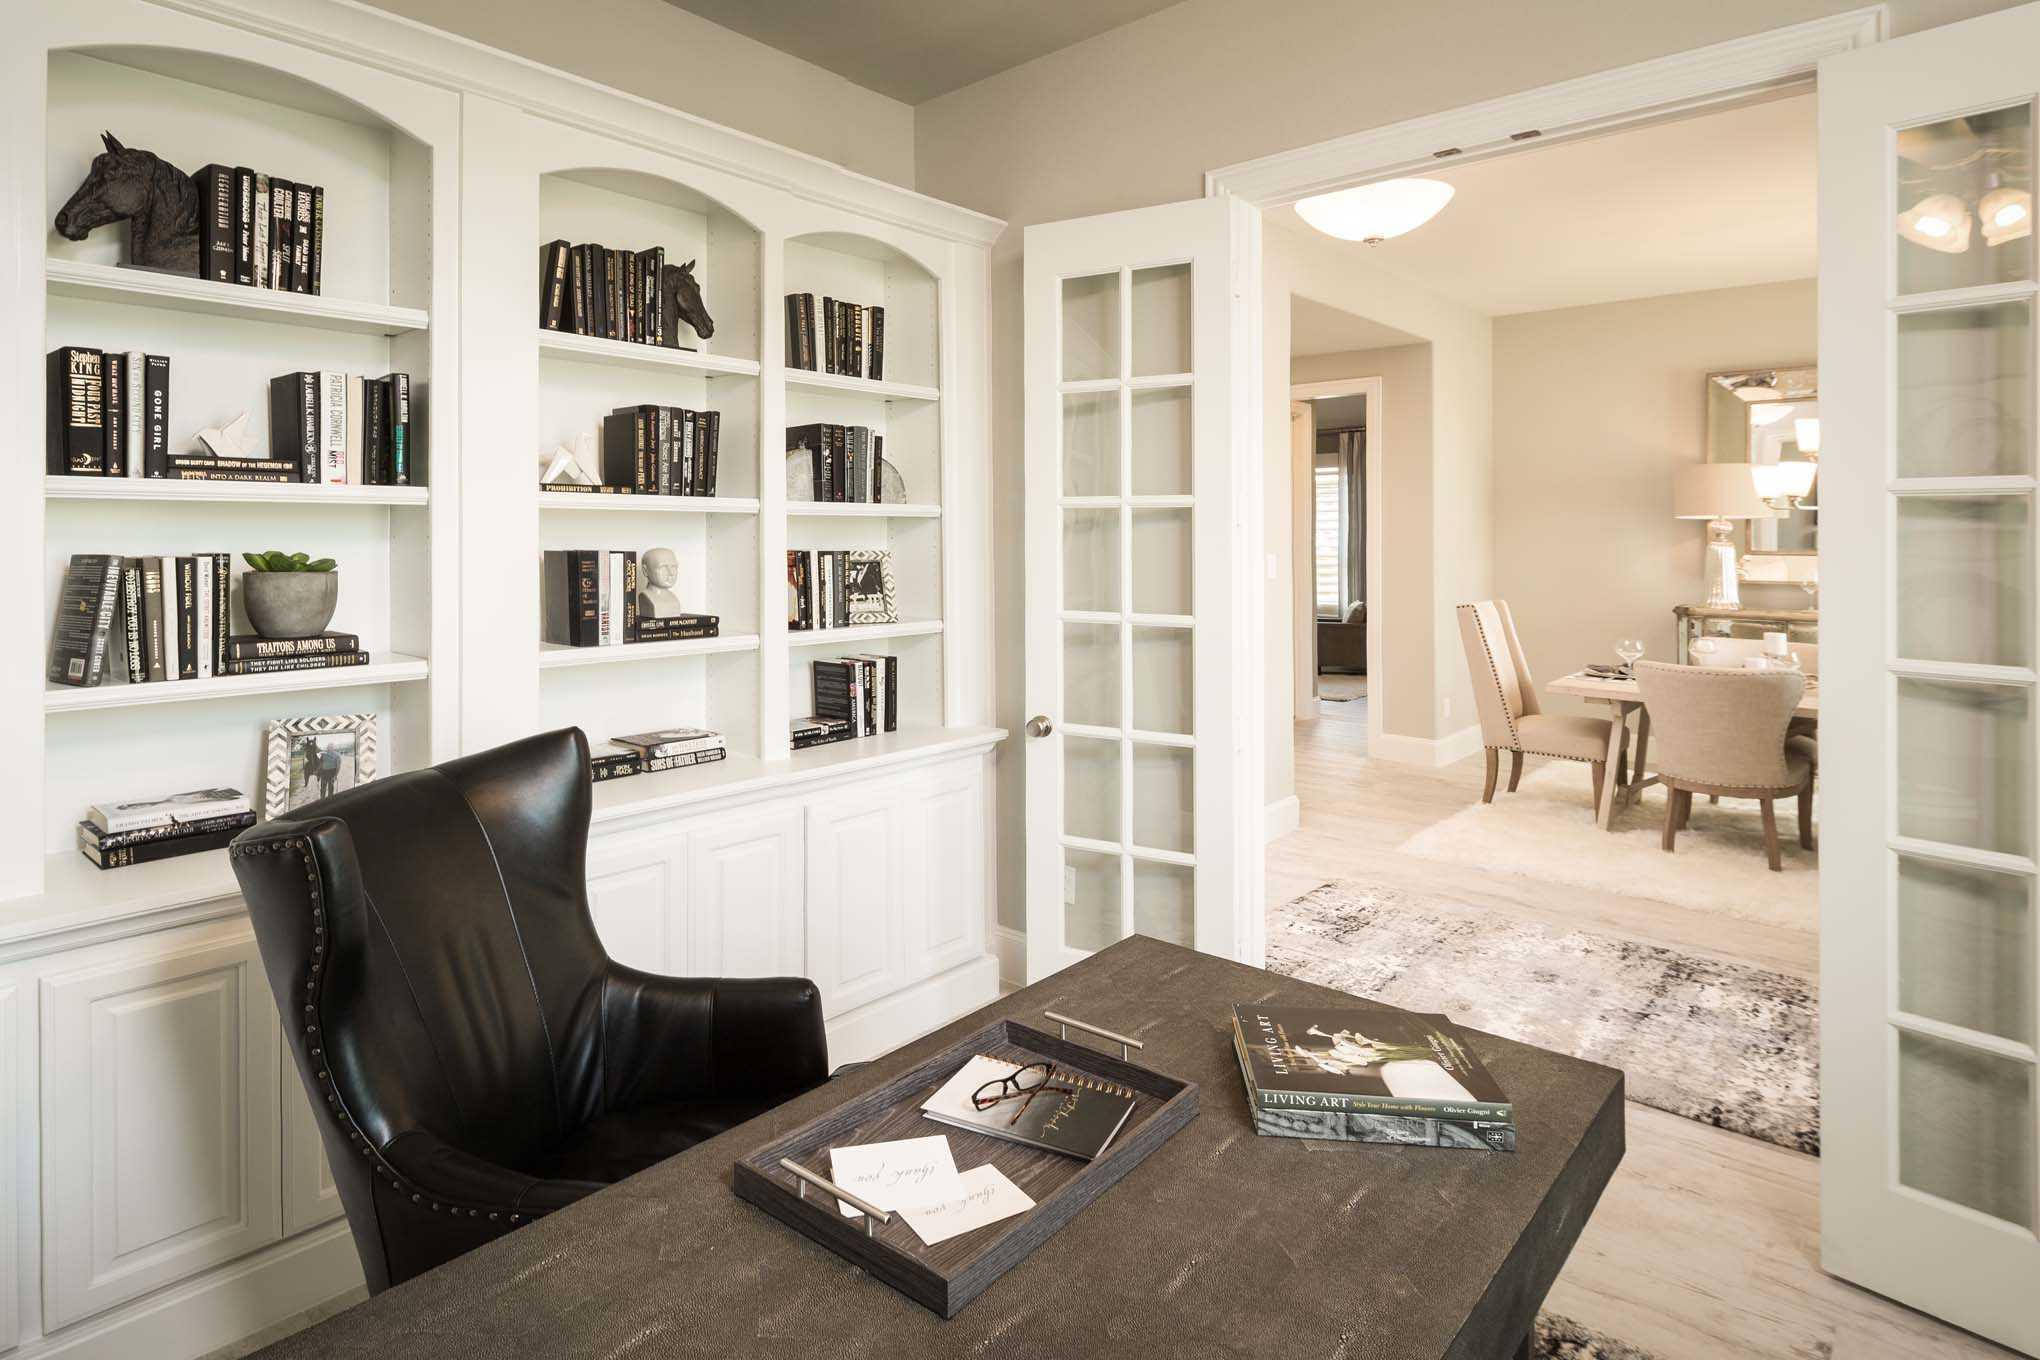 Representative Photo   study. Model Home in Houston Texas  Cinco Ranch 70s community